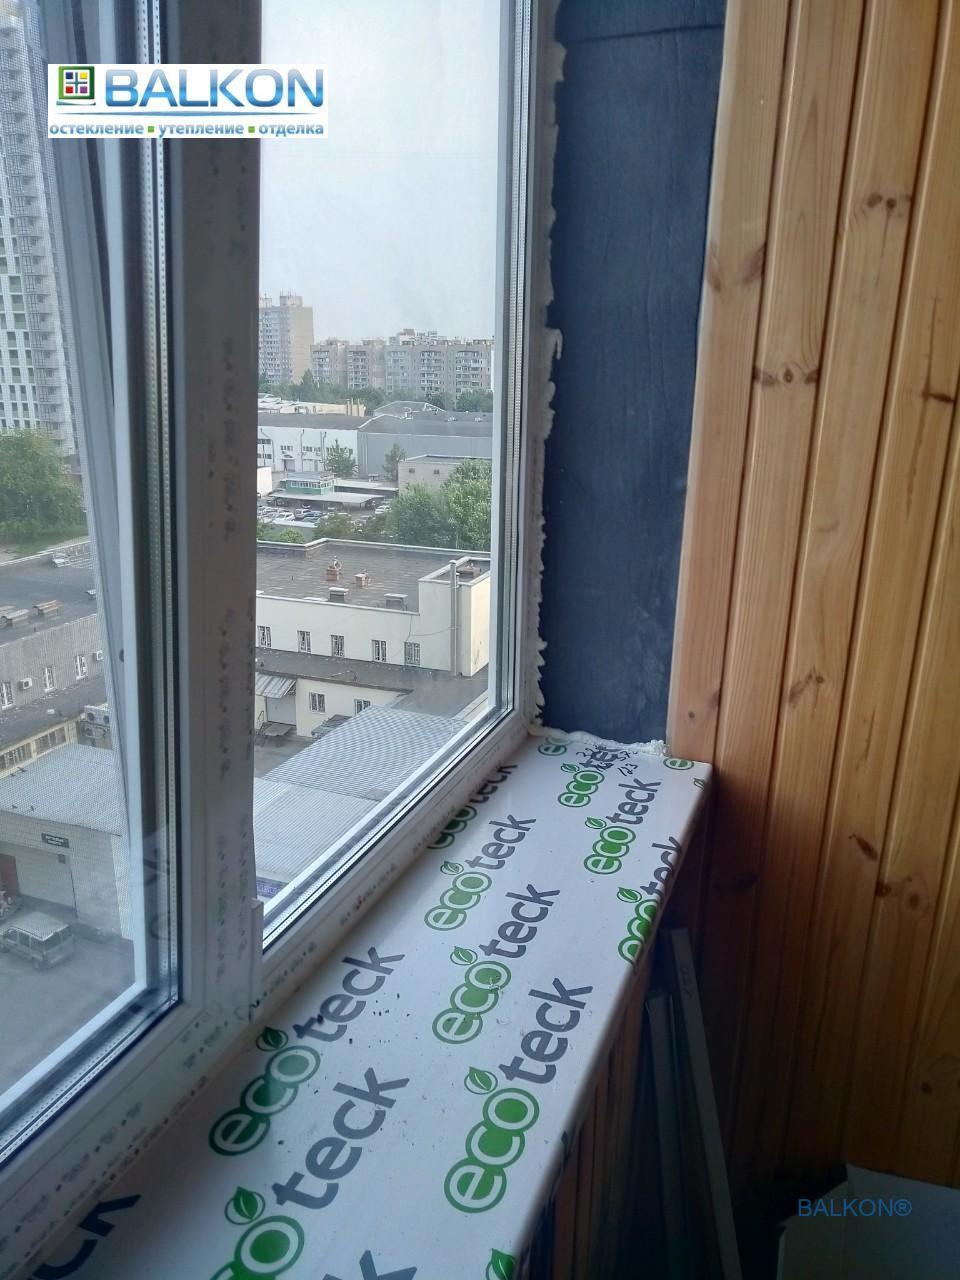 Подоконник на балкон (OpenTeck) Киев ул. Тростянецкая 6 - бригада 16